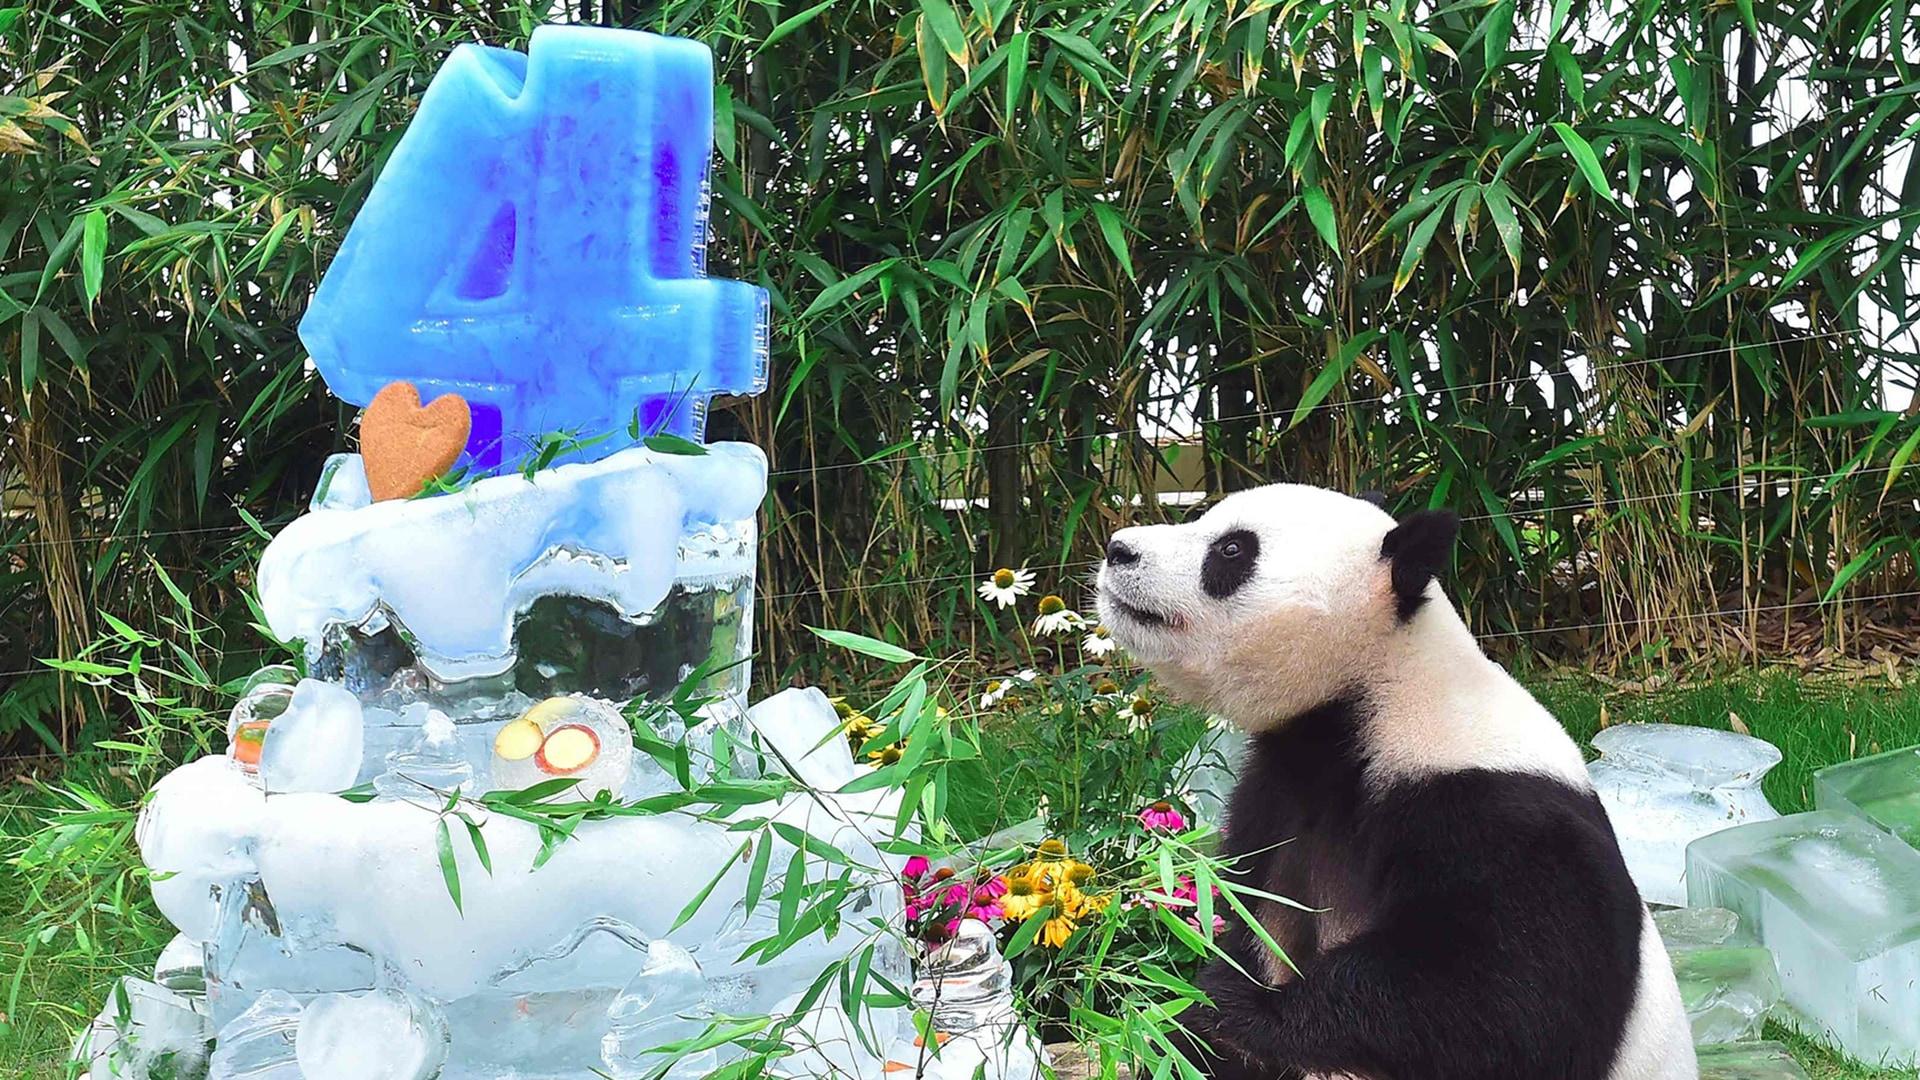 Image: TOPSHOT-SKOREA-CHINA-DIPLOMACY-ANIMAL-PANDA